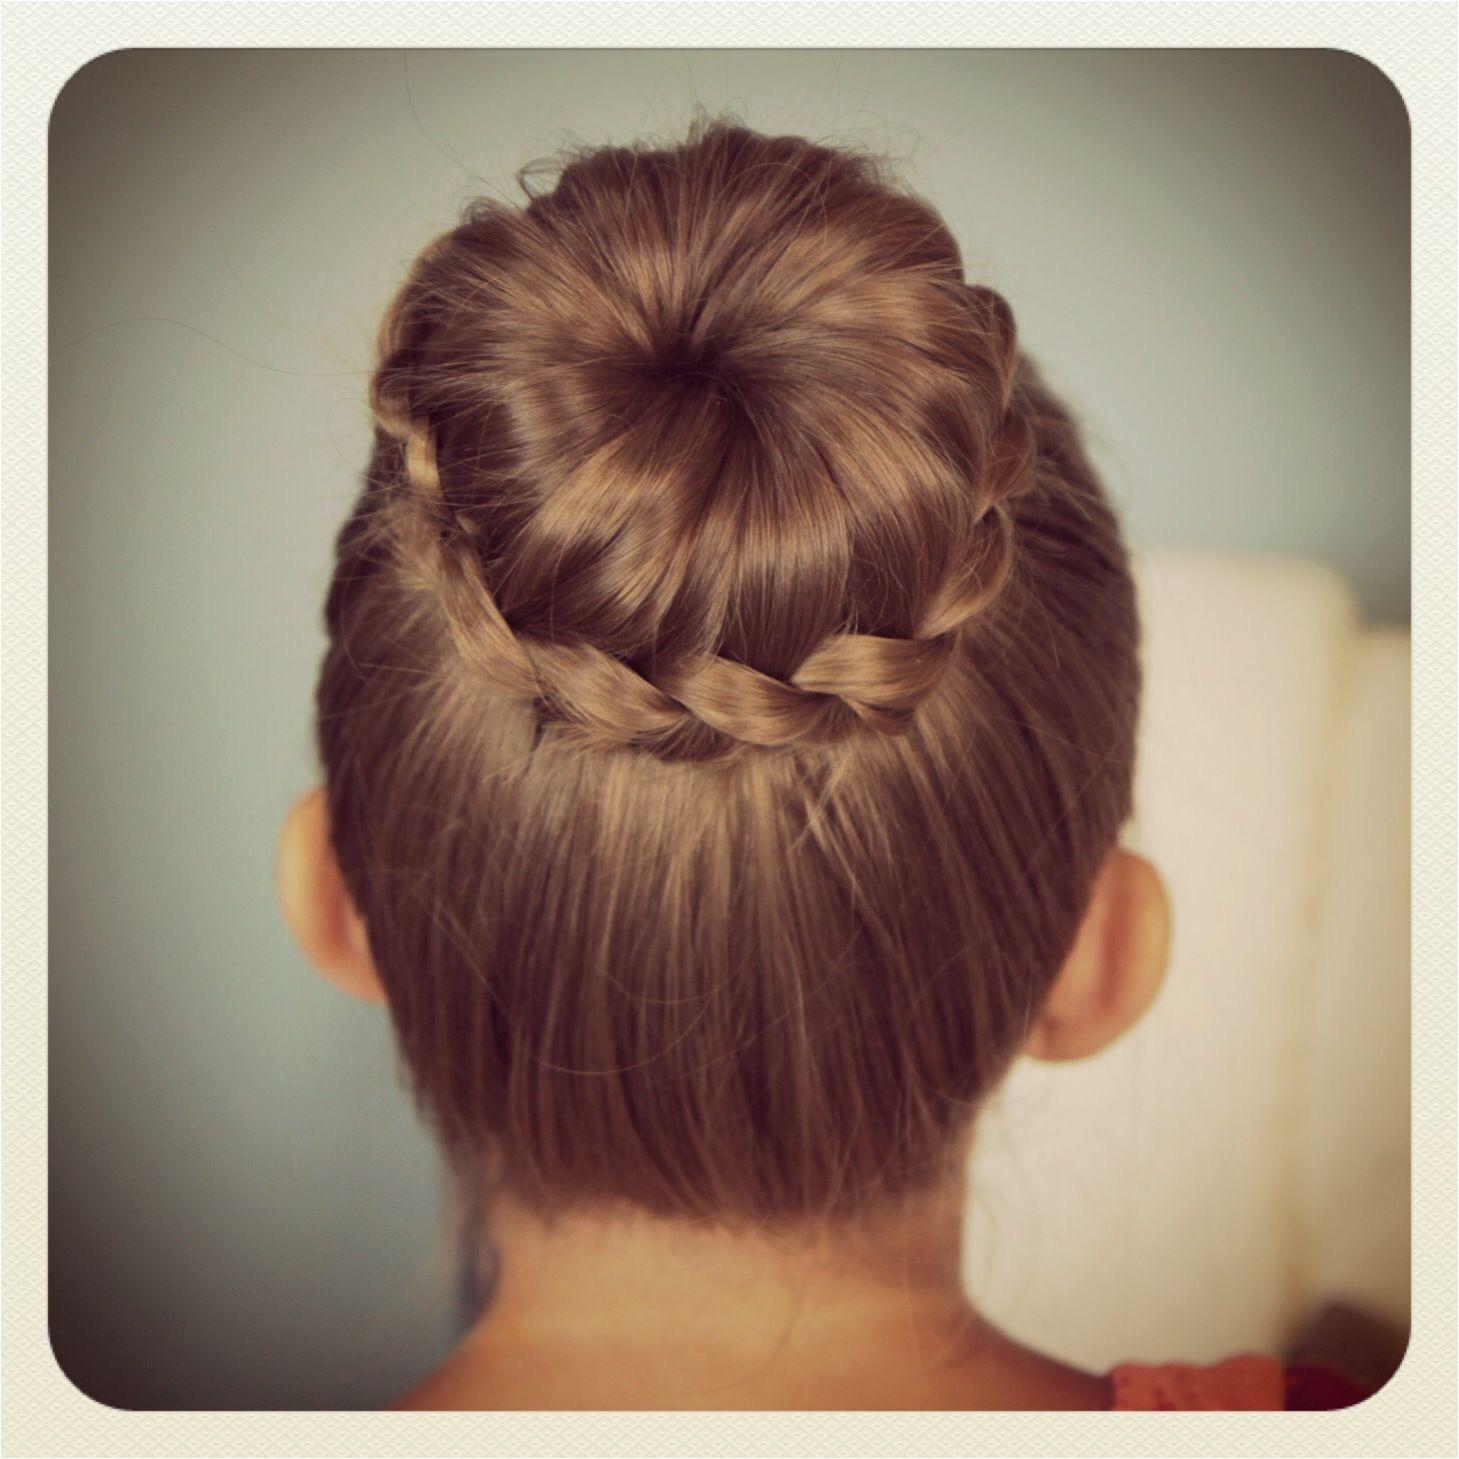 Hairstyle Cute Girl Best Cute Back to School Hair Cuts Lace Braided Bun Cute Updo